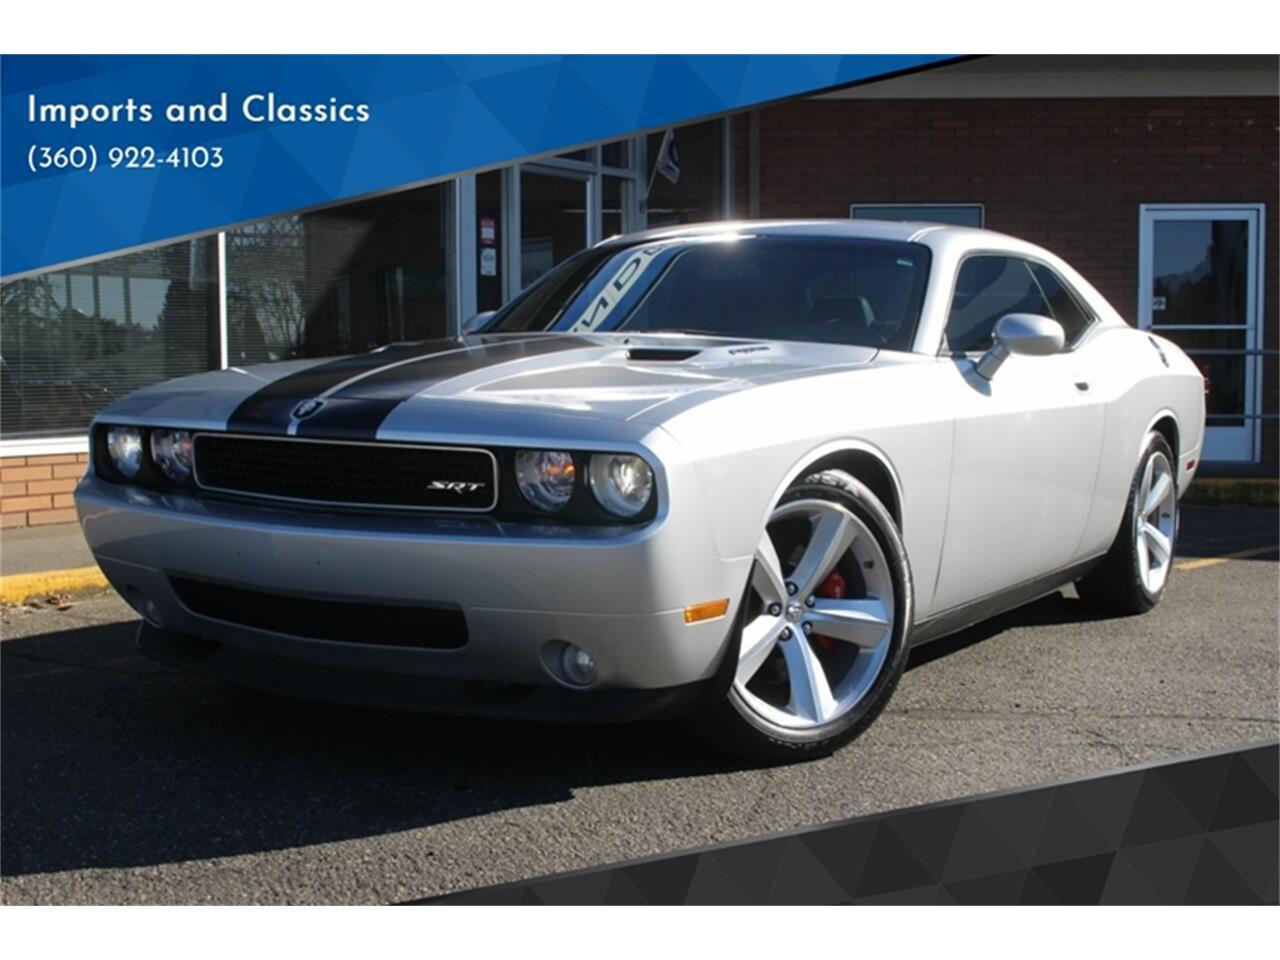 2010 Dodge Challenger For Sale >> 2010 Dodge Challenger For Sale Classiccars Com Cc 1192674